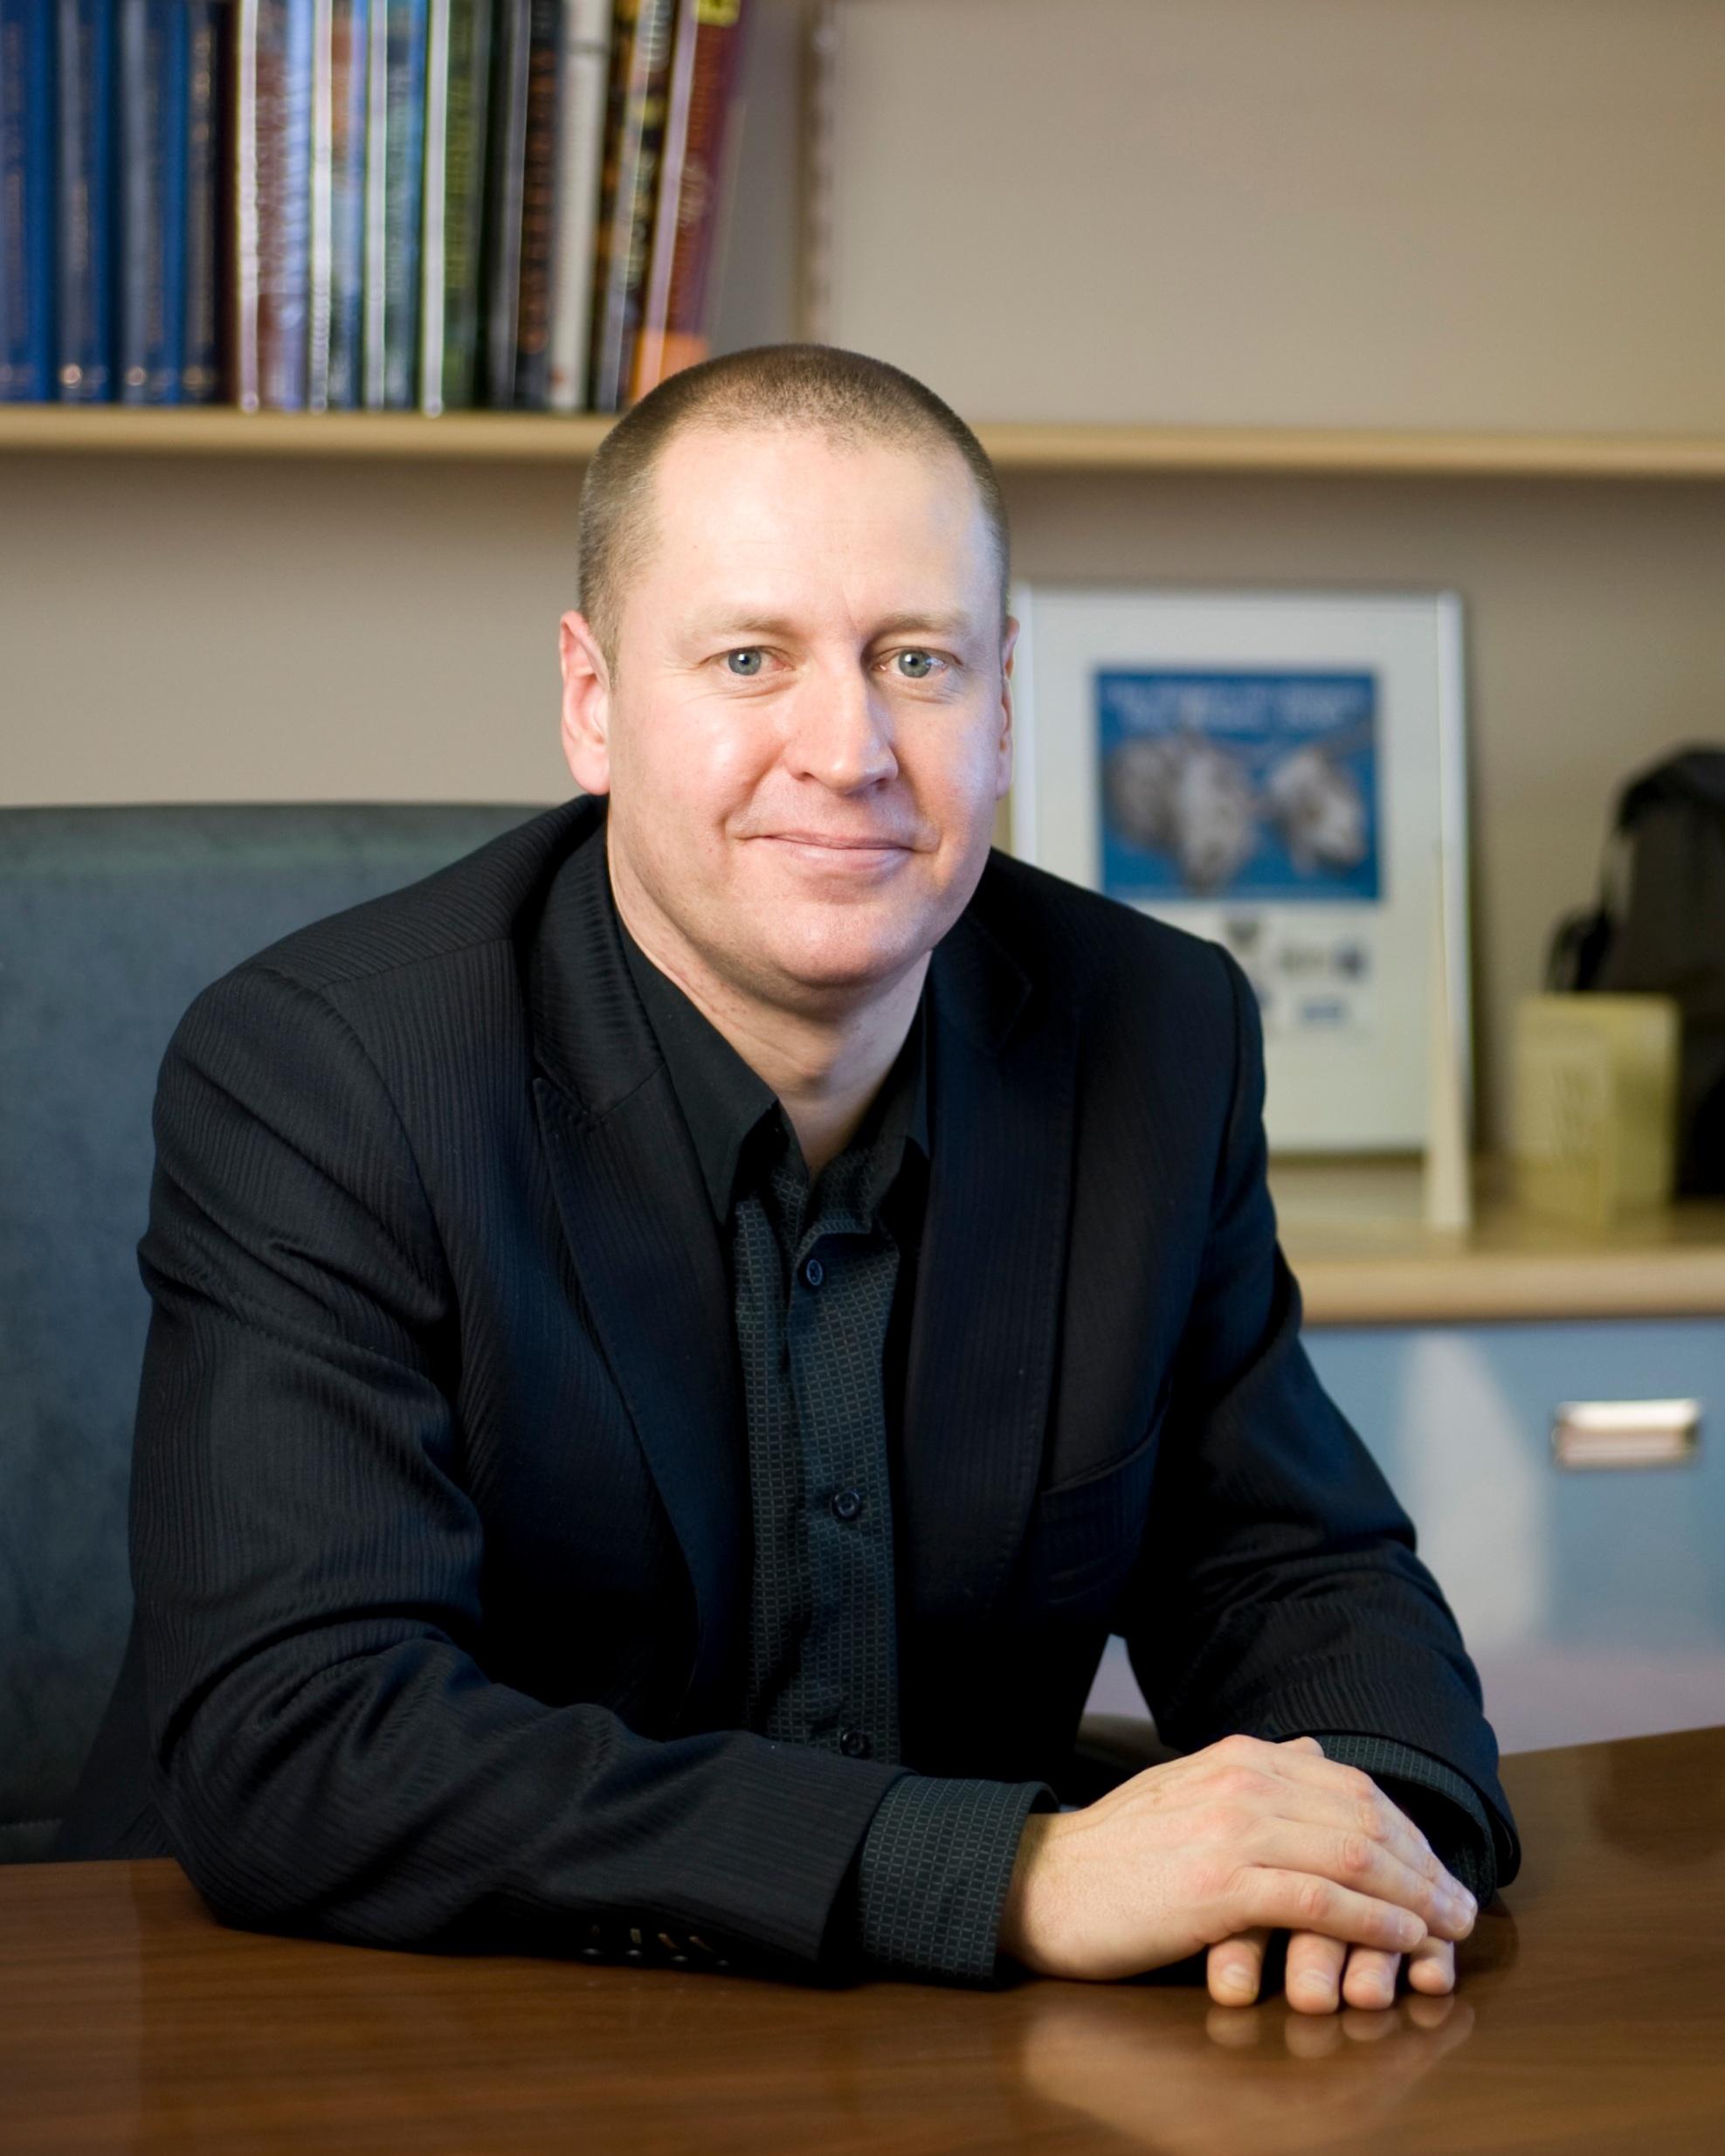 Prof Doug Hilton - WEHISHORTER CONTEXT